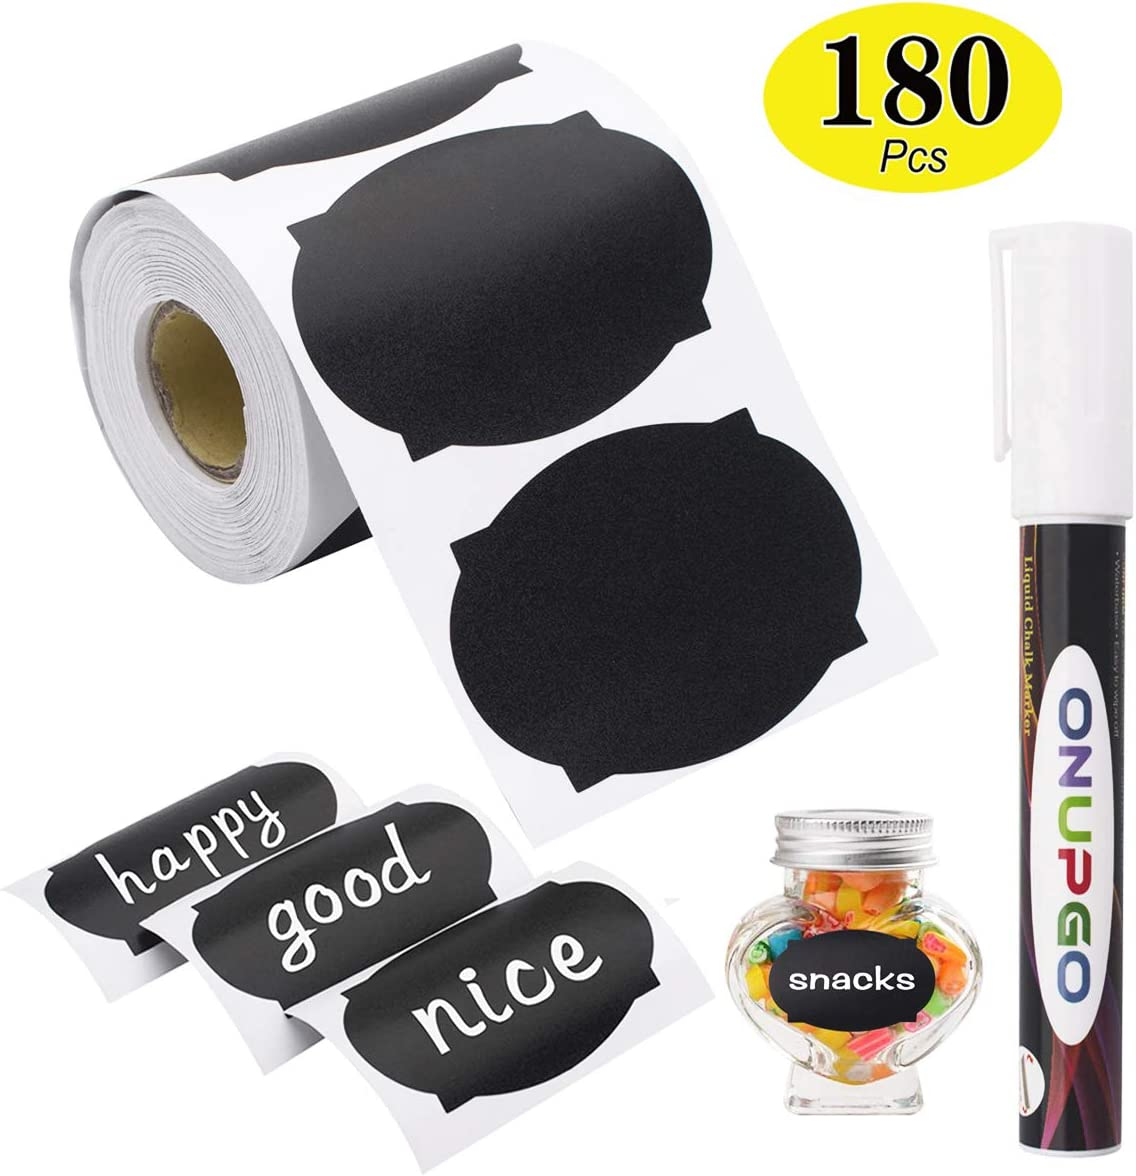 ONUPGO Chalkboard Labels-180pcs Waterproof Reusable Blackboard Stickers with 1 Liquid Chalk Marker for Mason Jars, Parties Decoration, Craft Rooms, Weddings, Storage, Organize Your Home & Kitchen